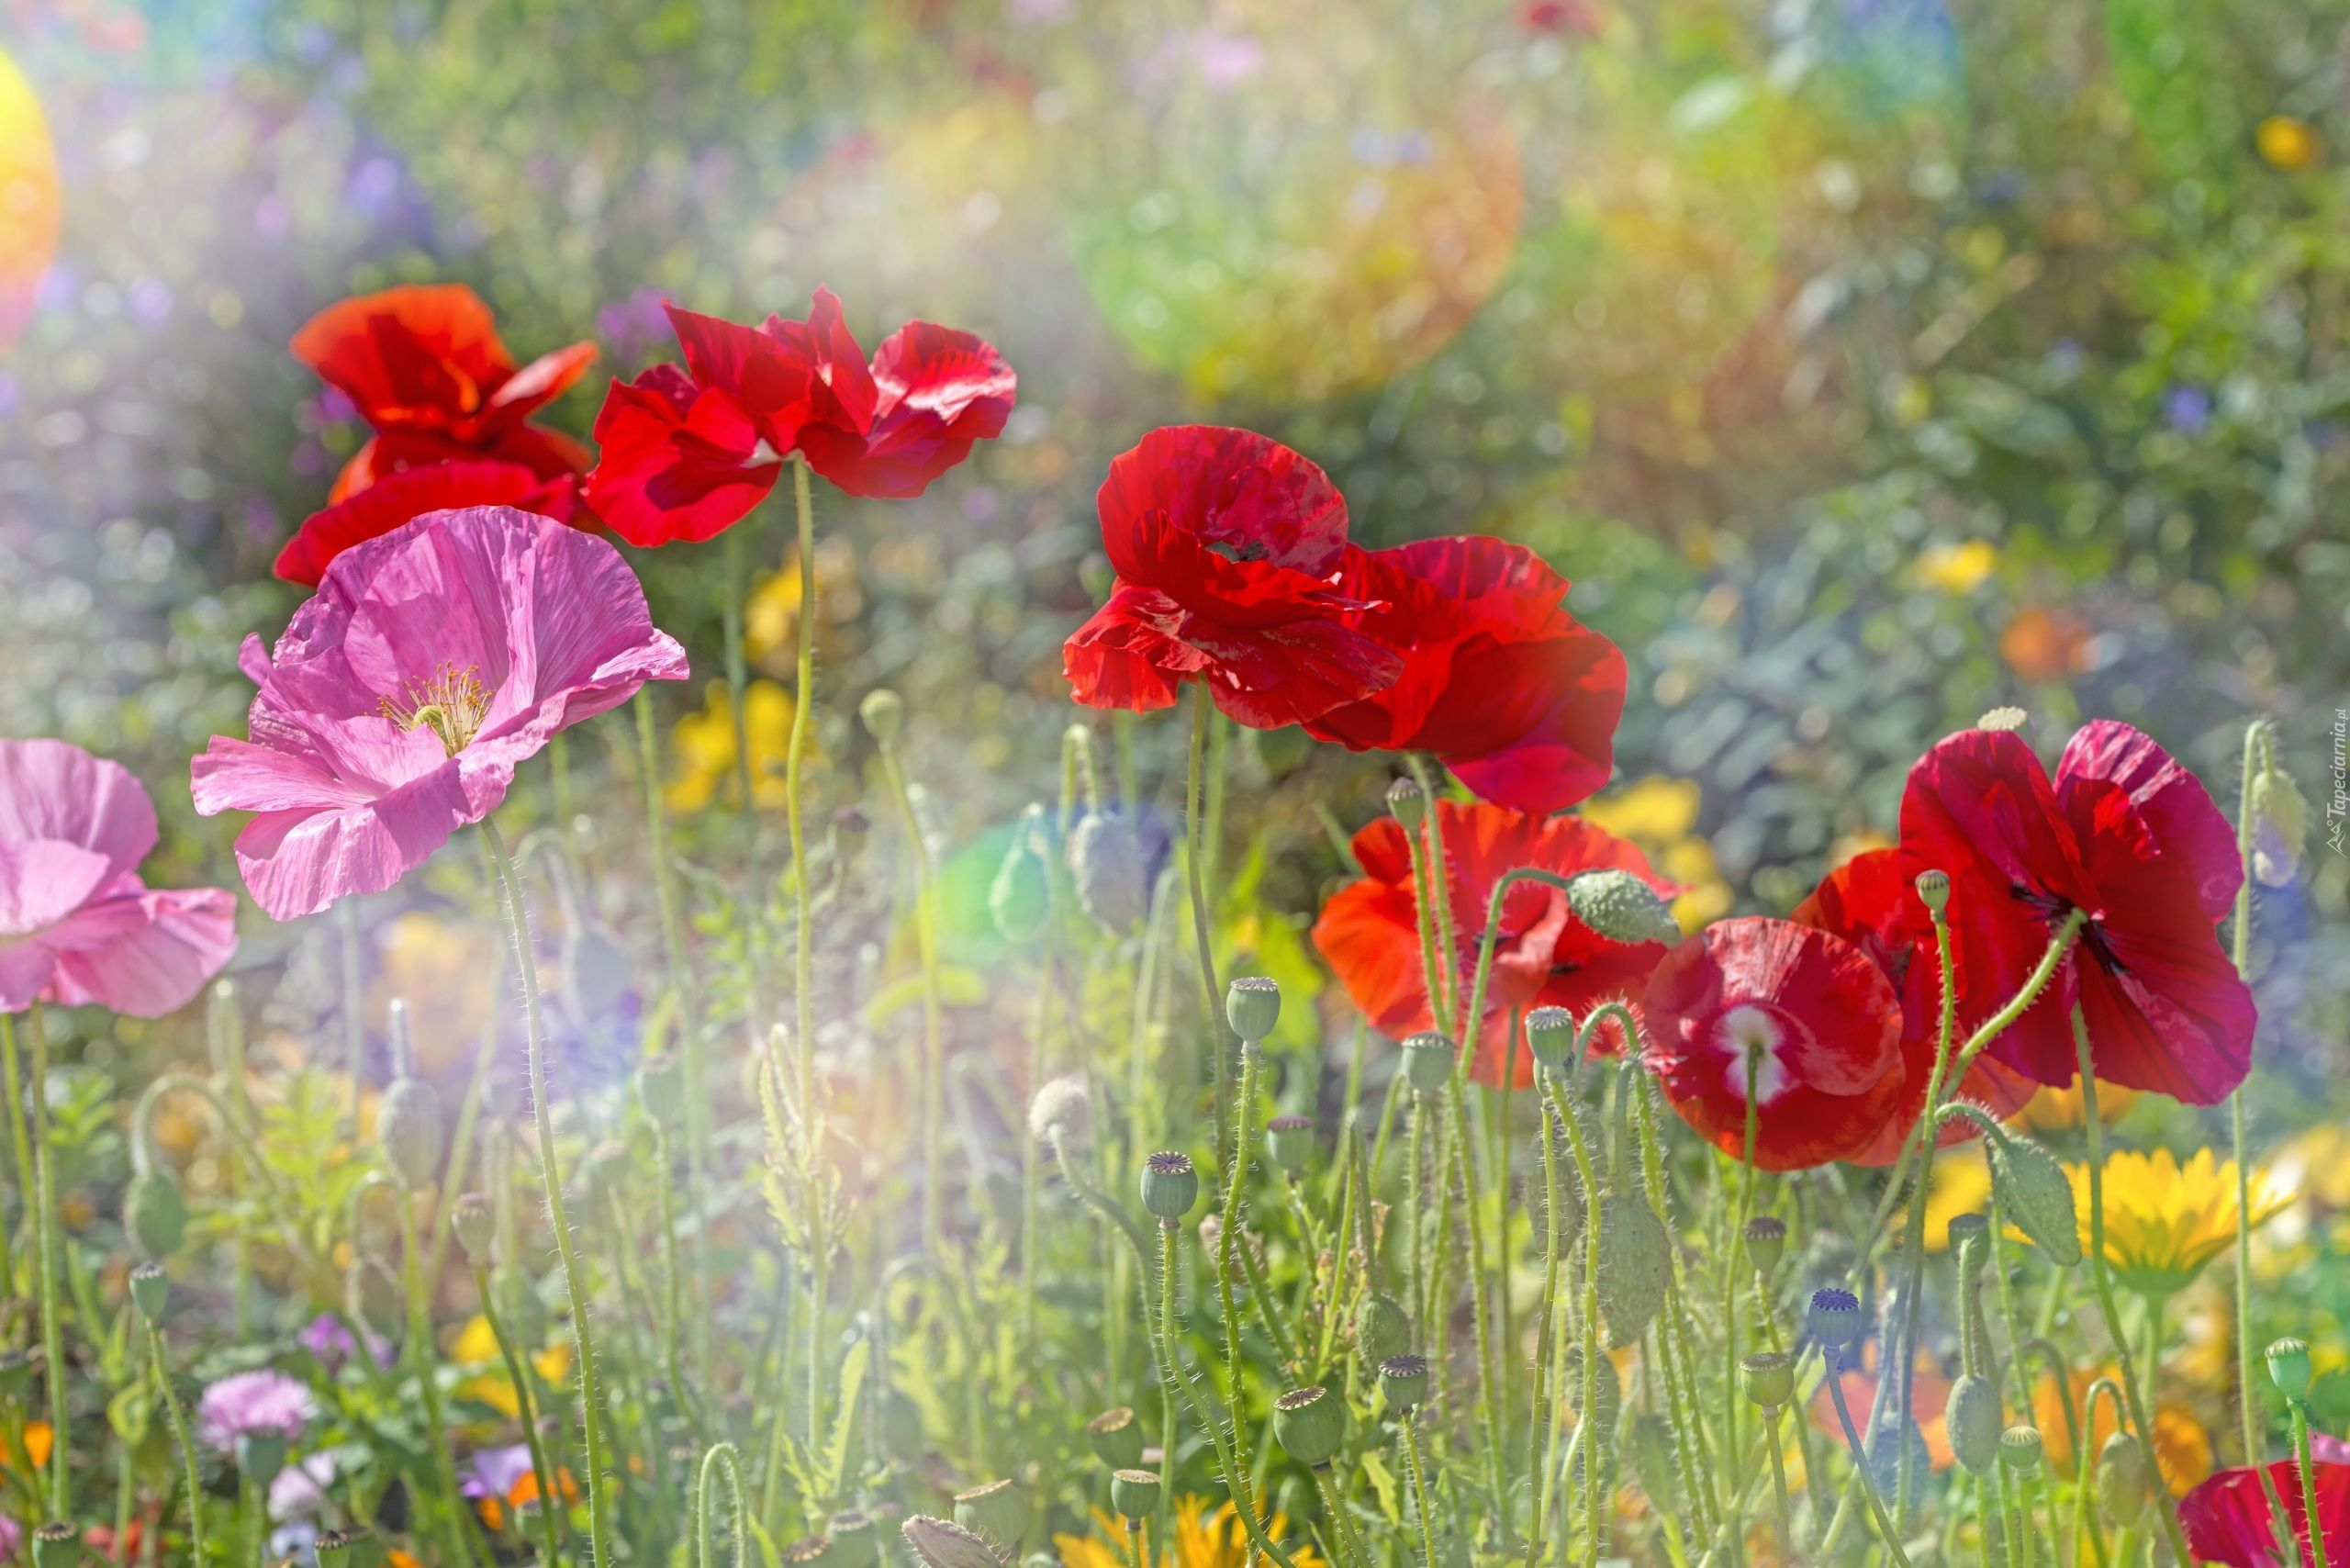 Chmury Polne Kwiaty Drzewo Gory Laka Na Pulpit Spring Landscape Scenic Photos Photography Wallpaper